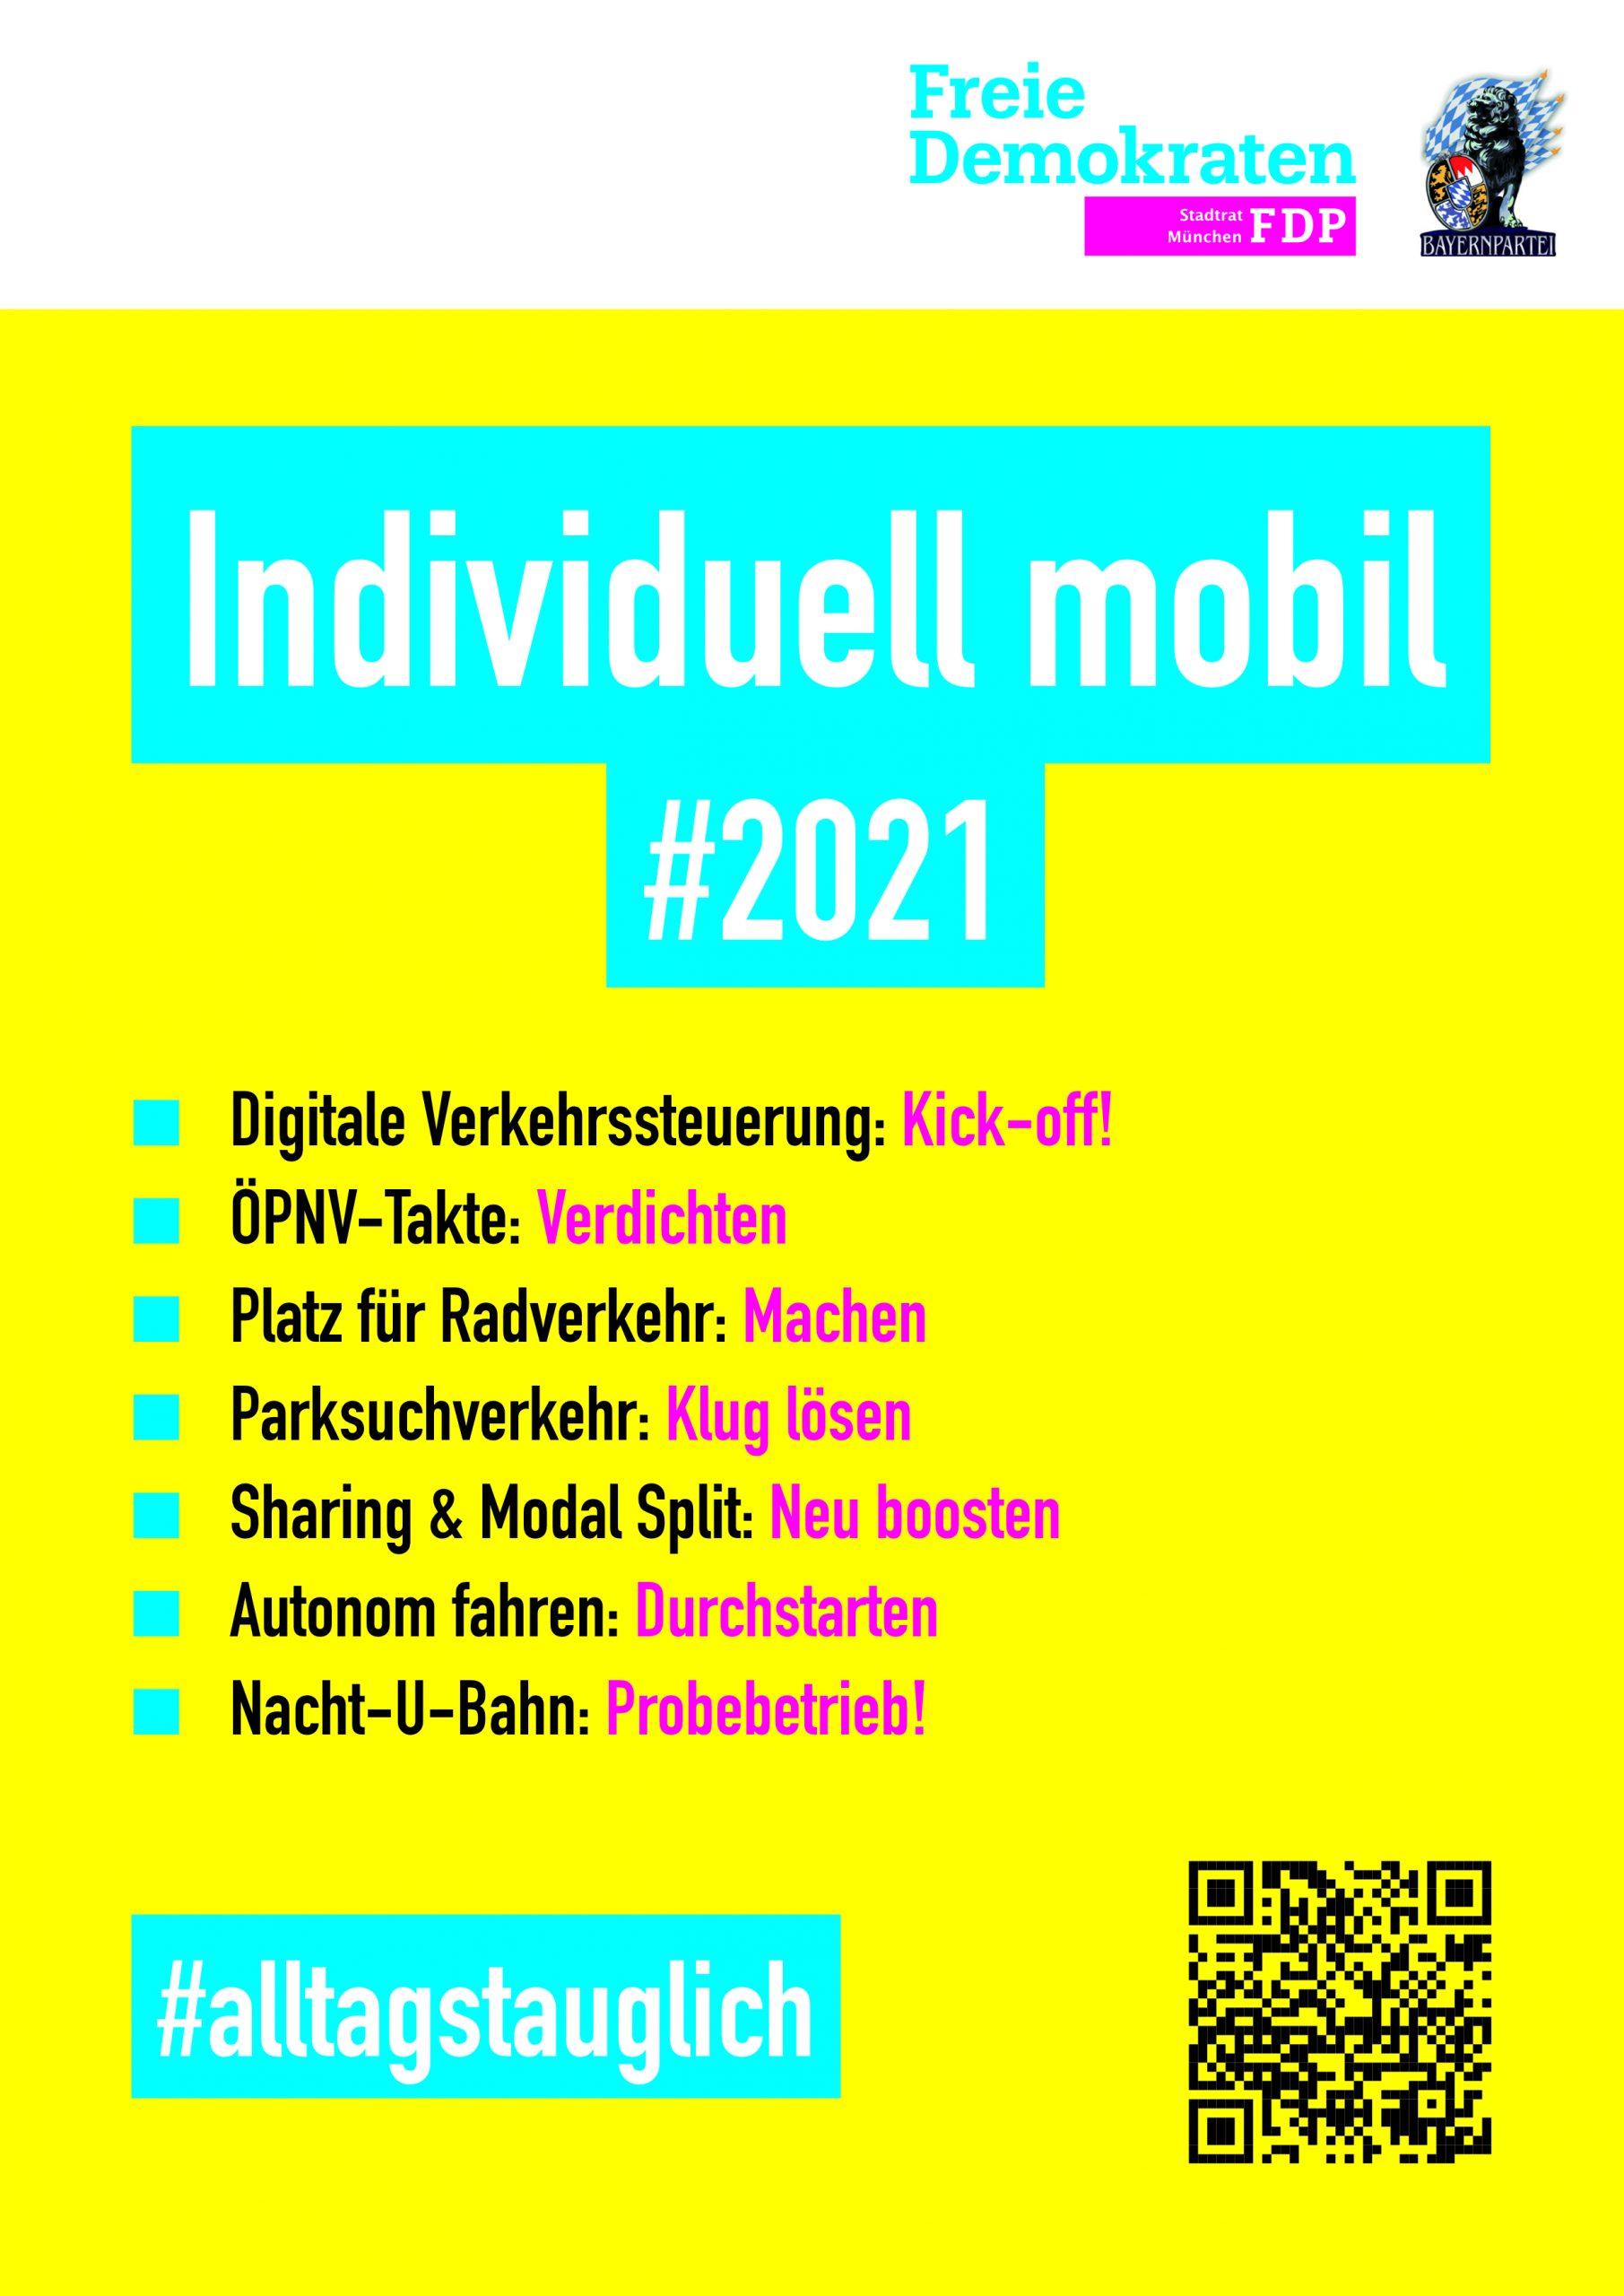 # Individuell mobil 2021 FDP BAYERNPARTEI Stadtratsfraktion München